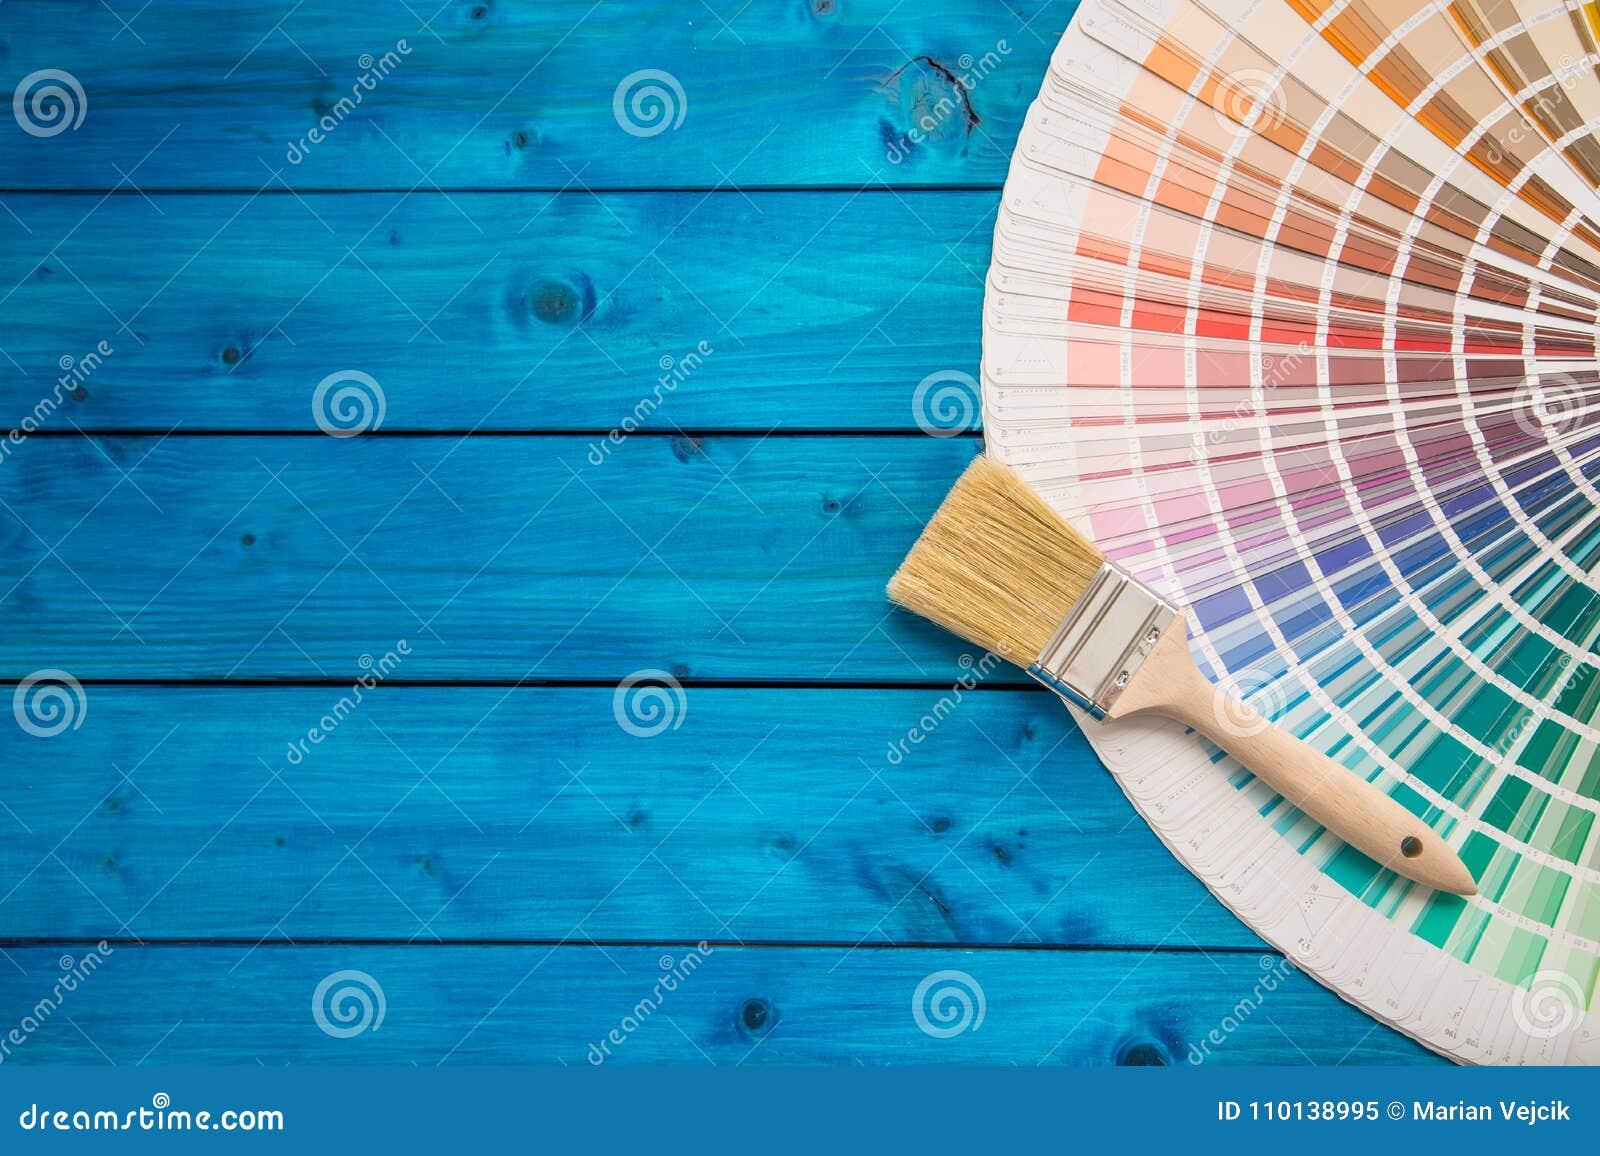 Pinte latas paleta de cores, latas abertas com as escovas na tabela azul